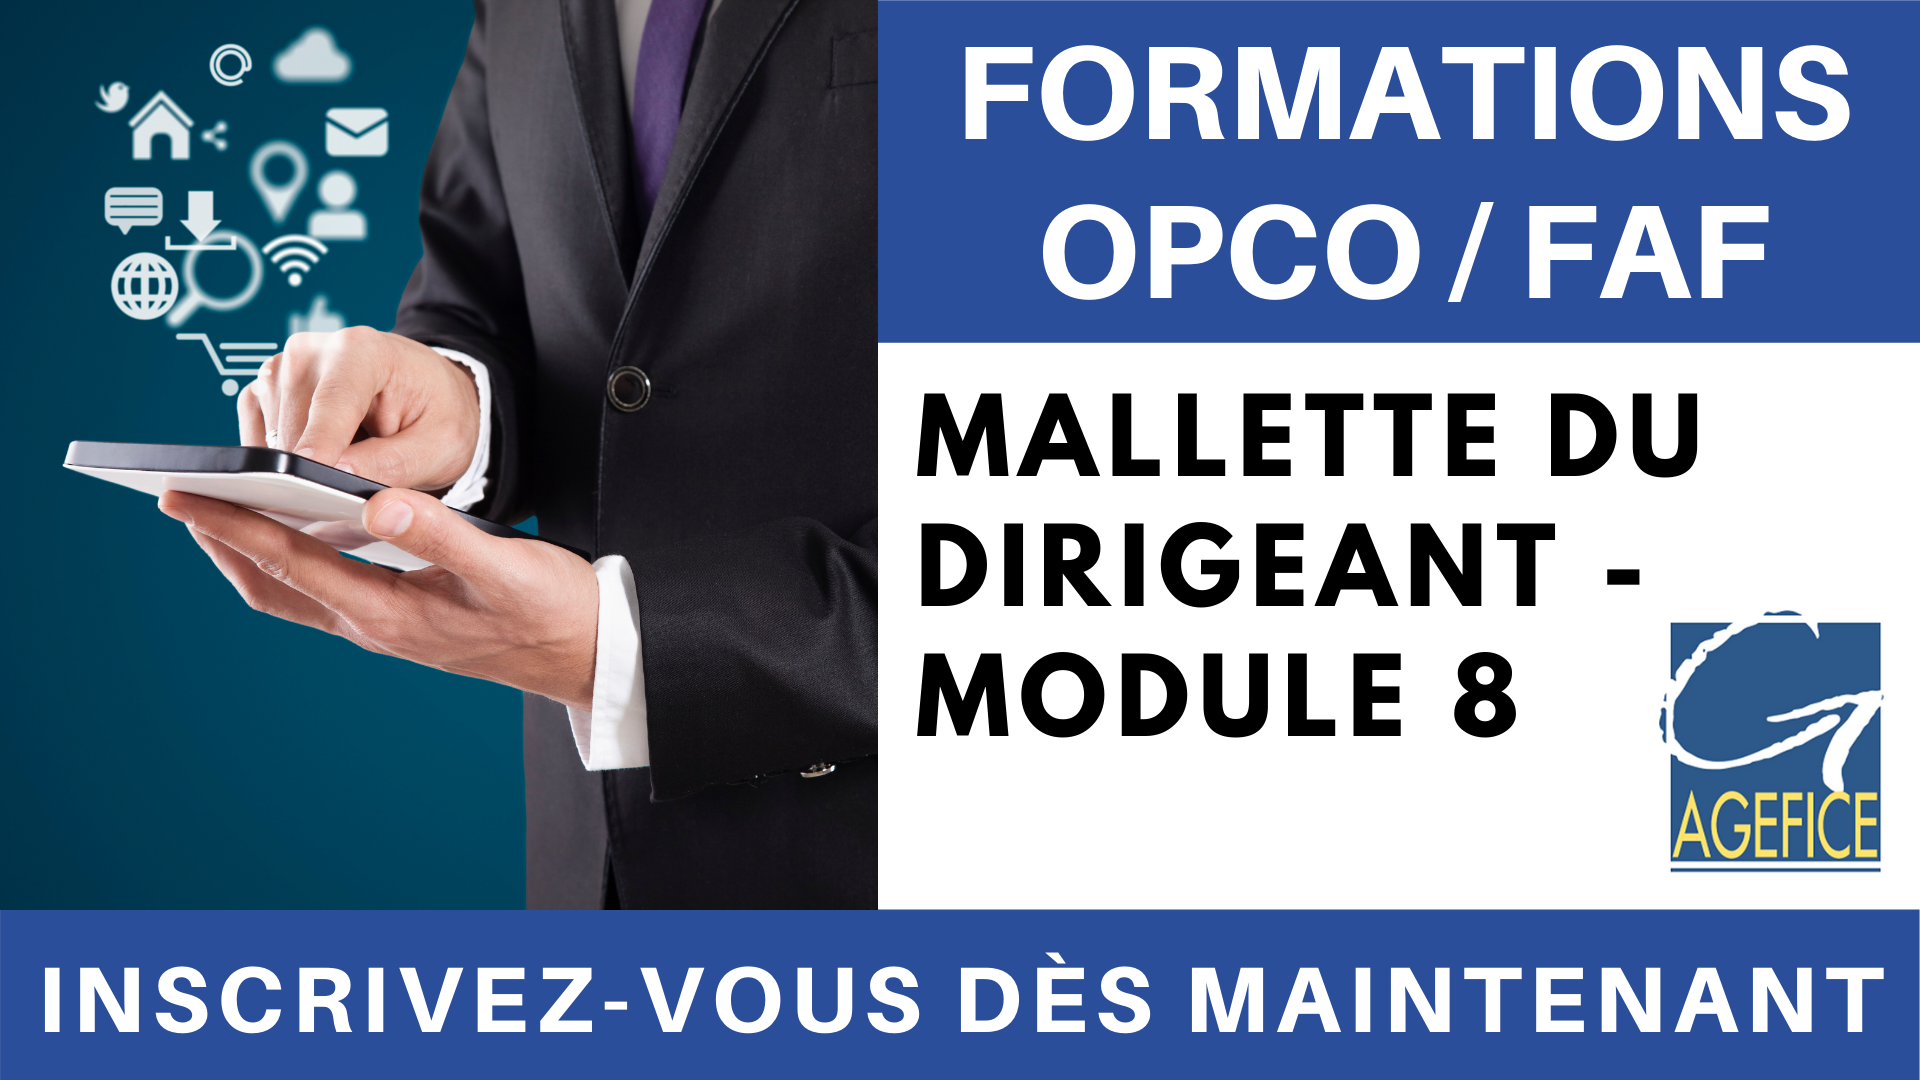 Vidéo - Formation OPCO_FAF Mallette du dirigeant mod 8